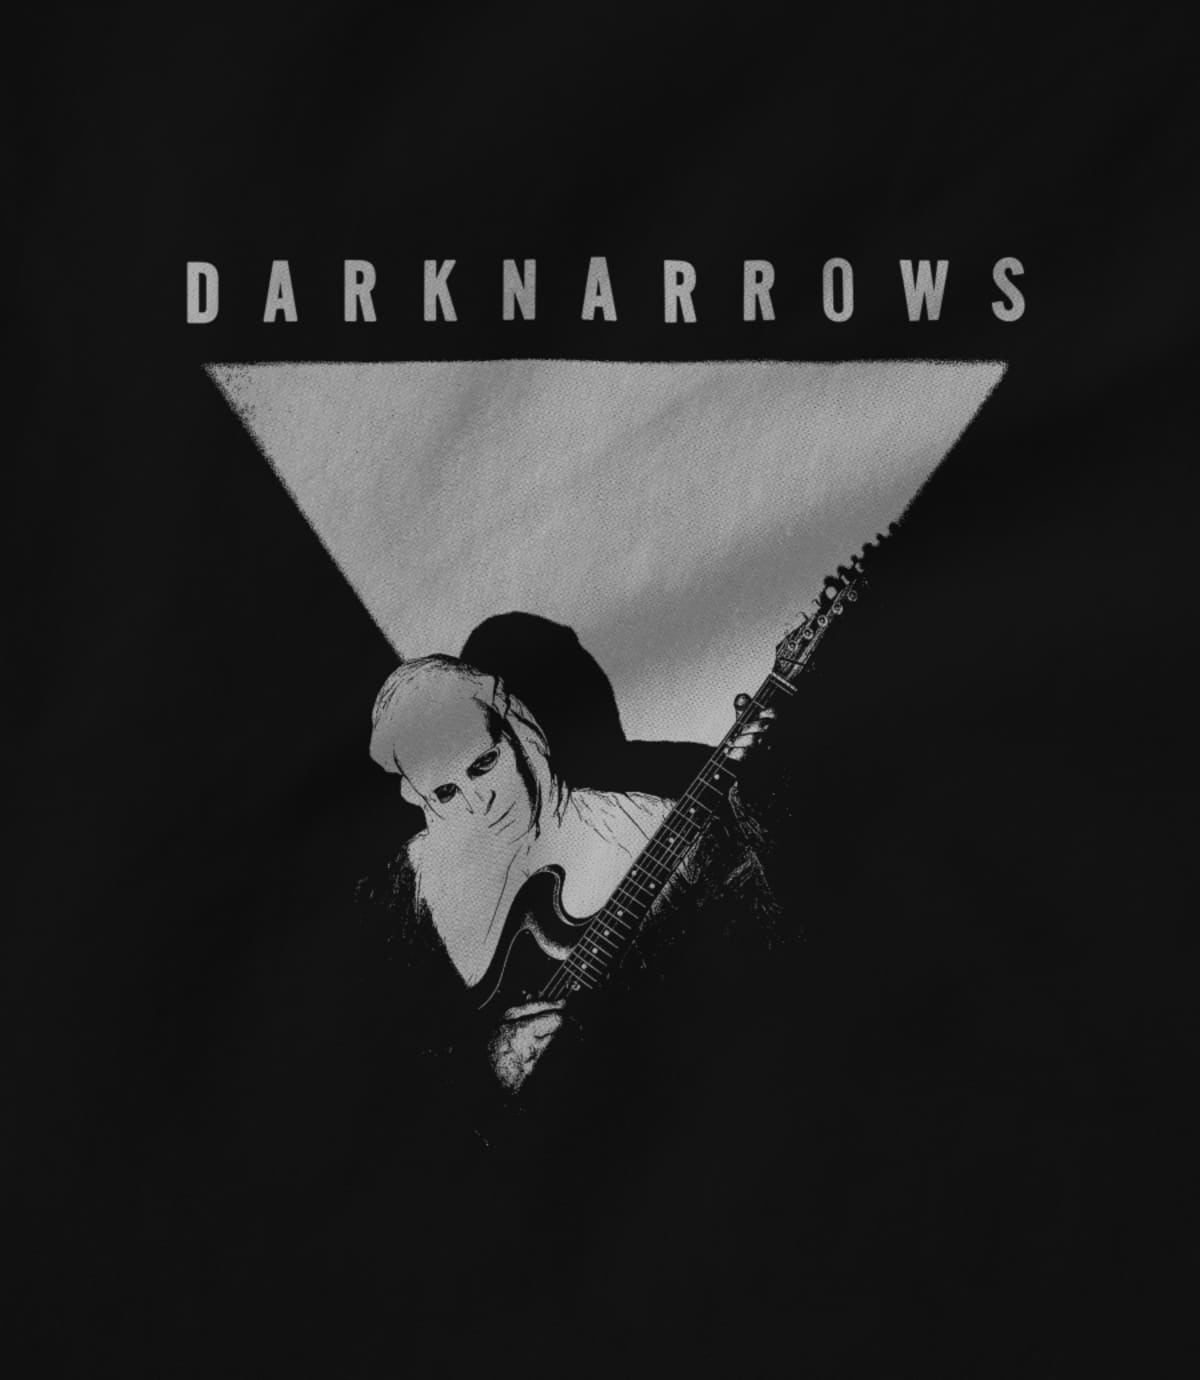 Dark Narrows